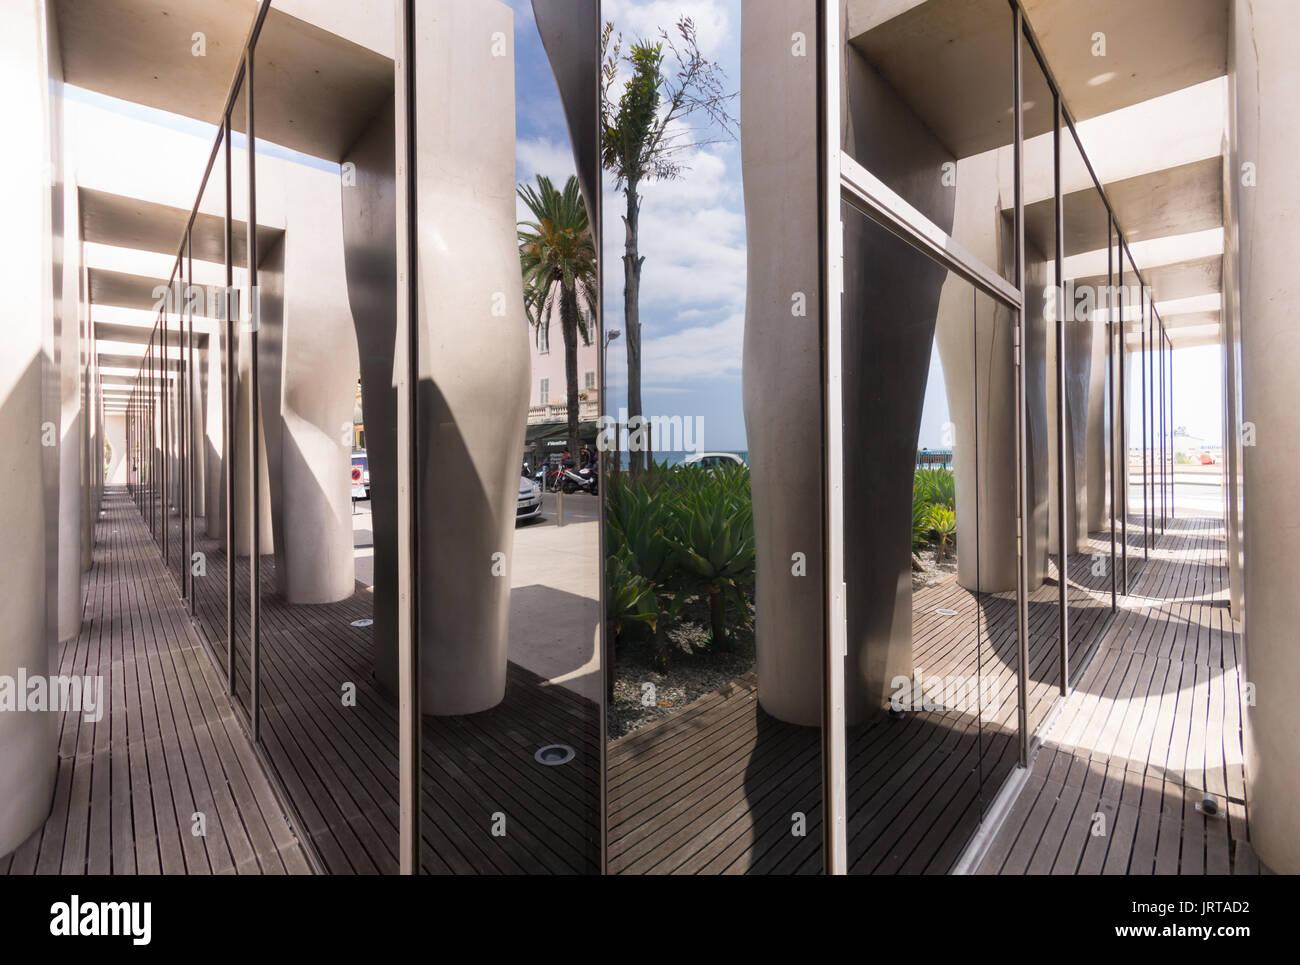 Jean Cocteau Museum, Menton, French Riviera: architect Rudy Ricciotti exterior 1 colonnade mirror Inexhibit - Stock Image